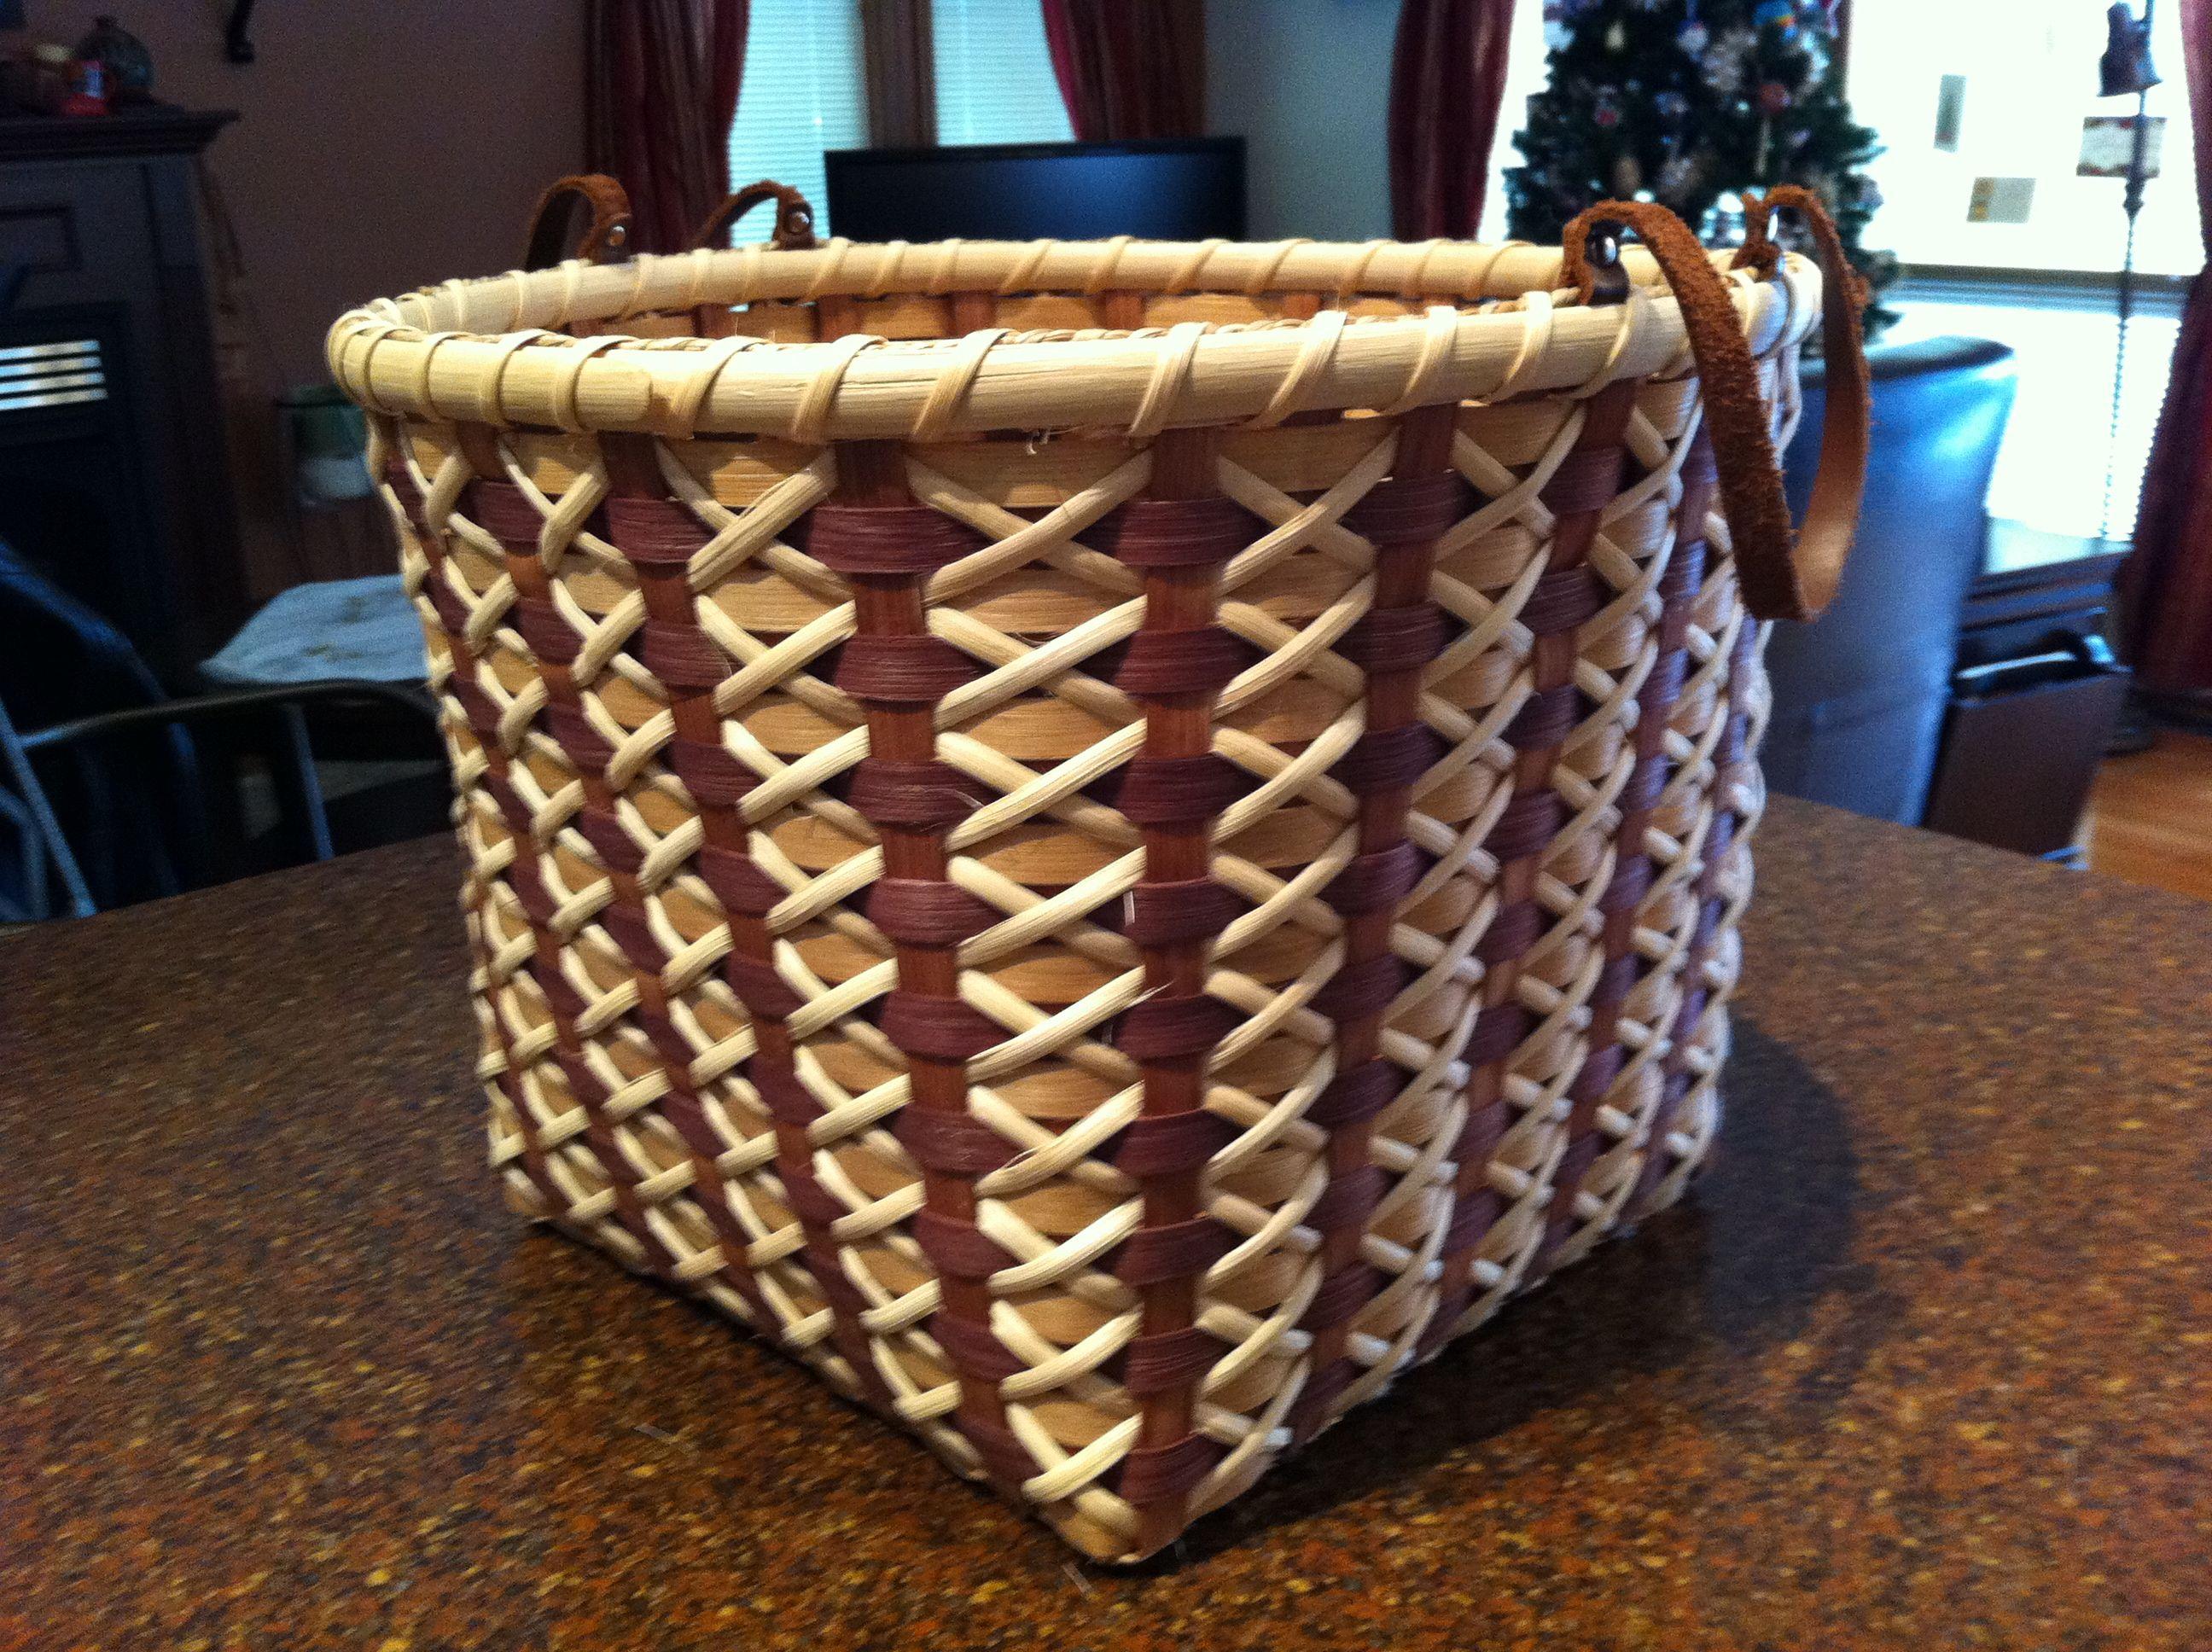 Basket Weaving Handles : Cross stitch bushel basket with leather handles